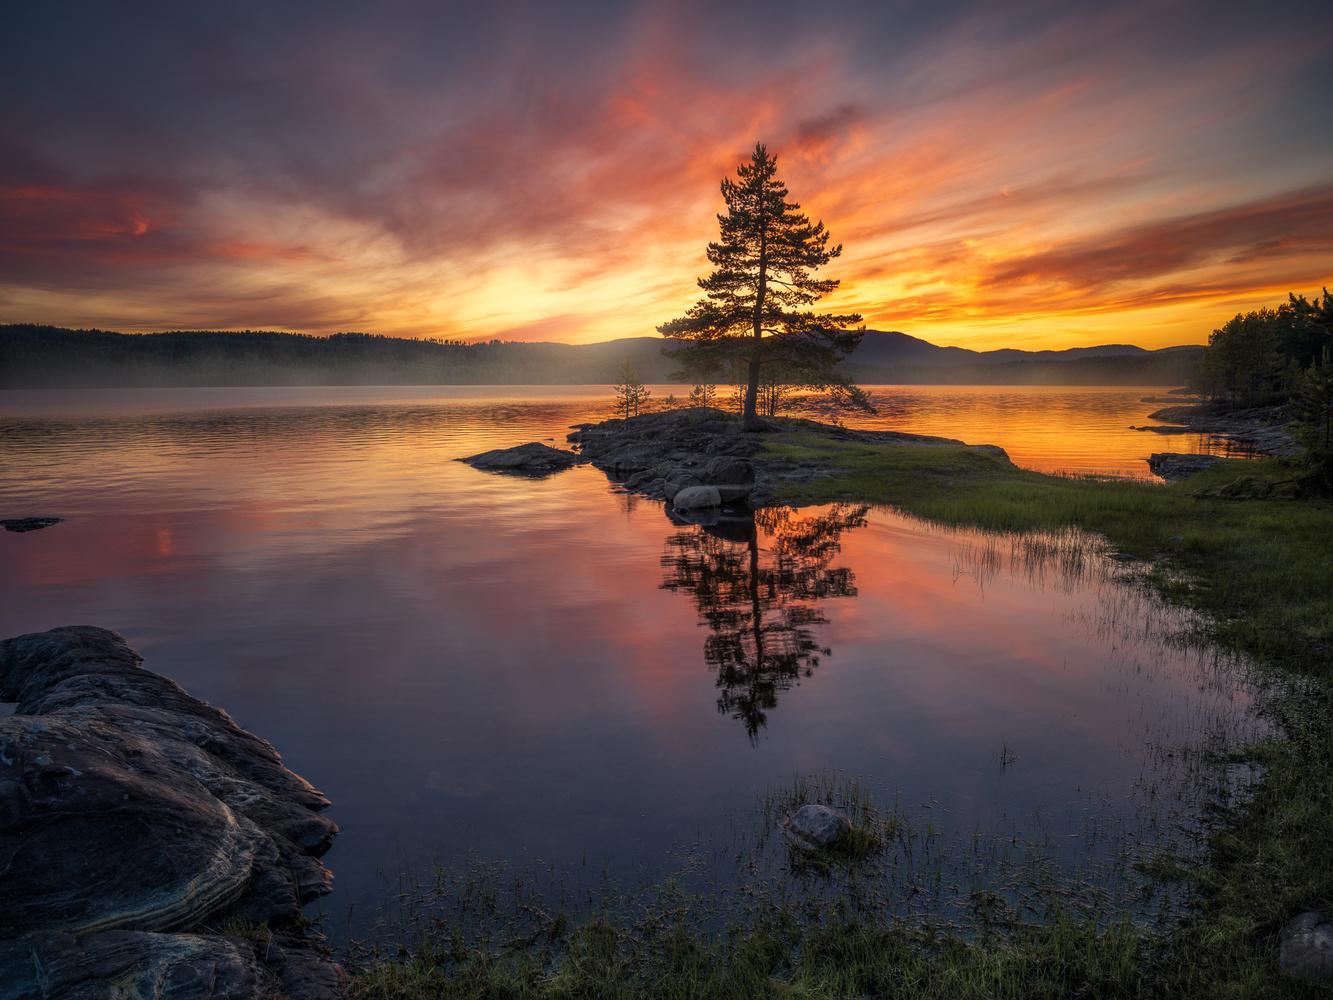 The Warmth of Summer by Ole Henrik Skjelstad